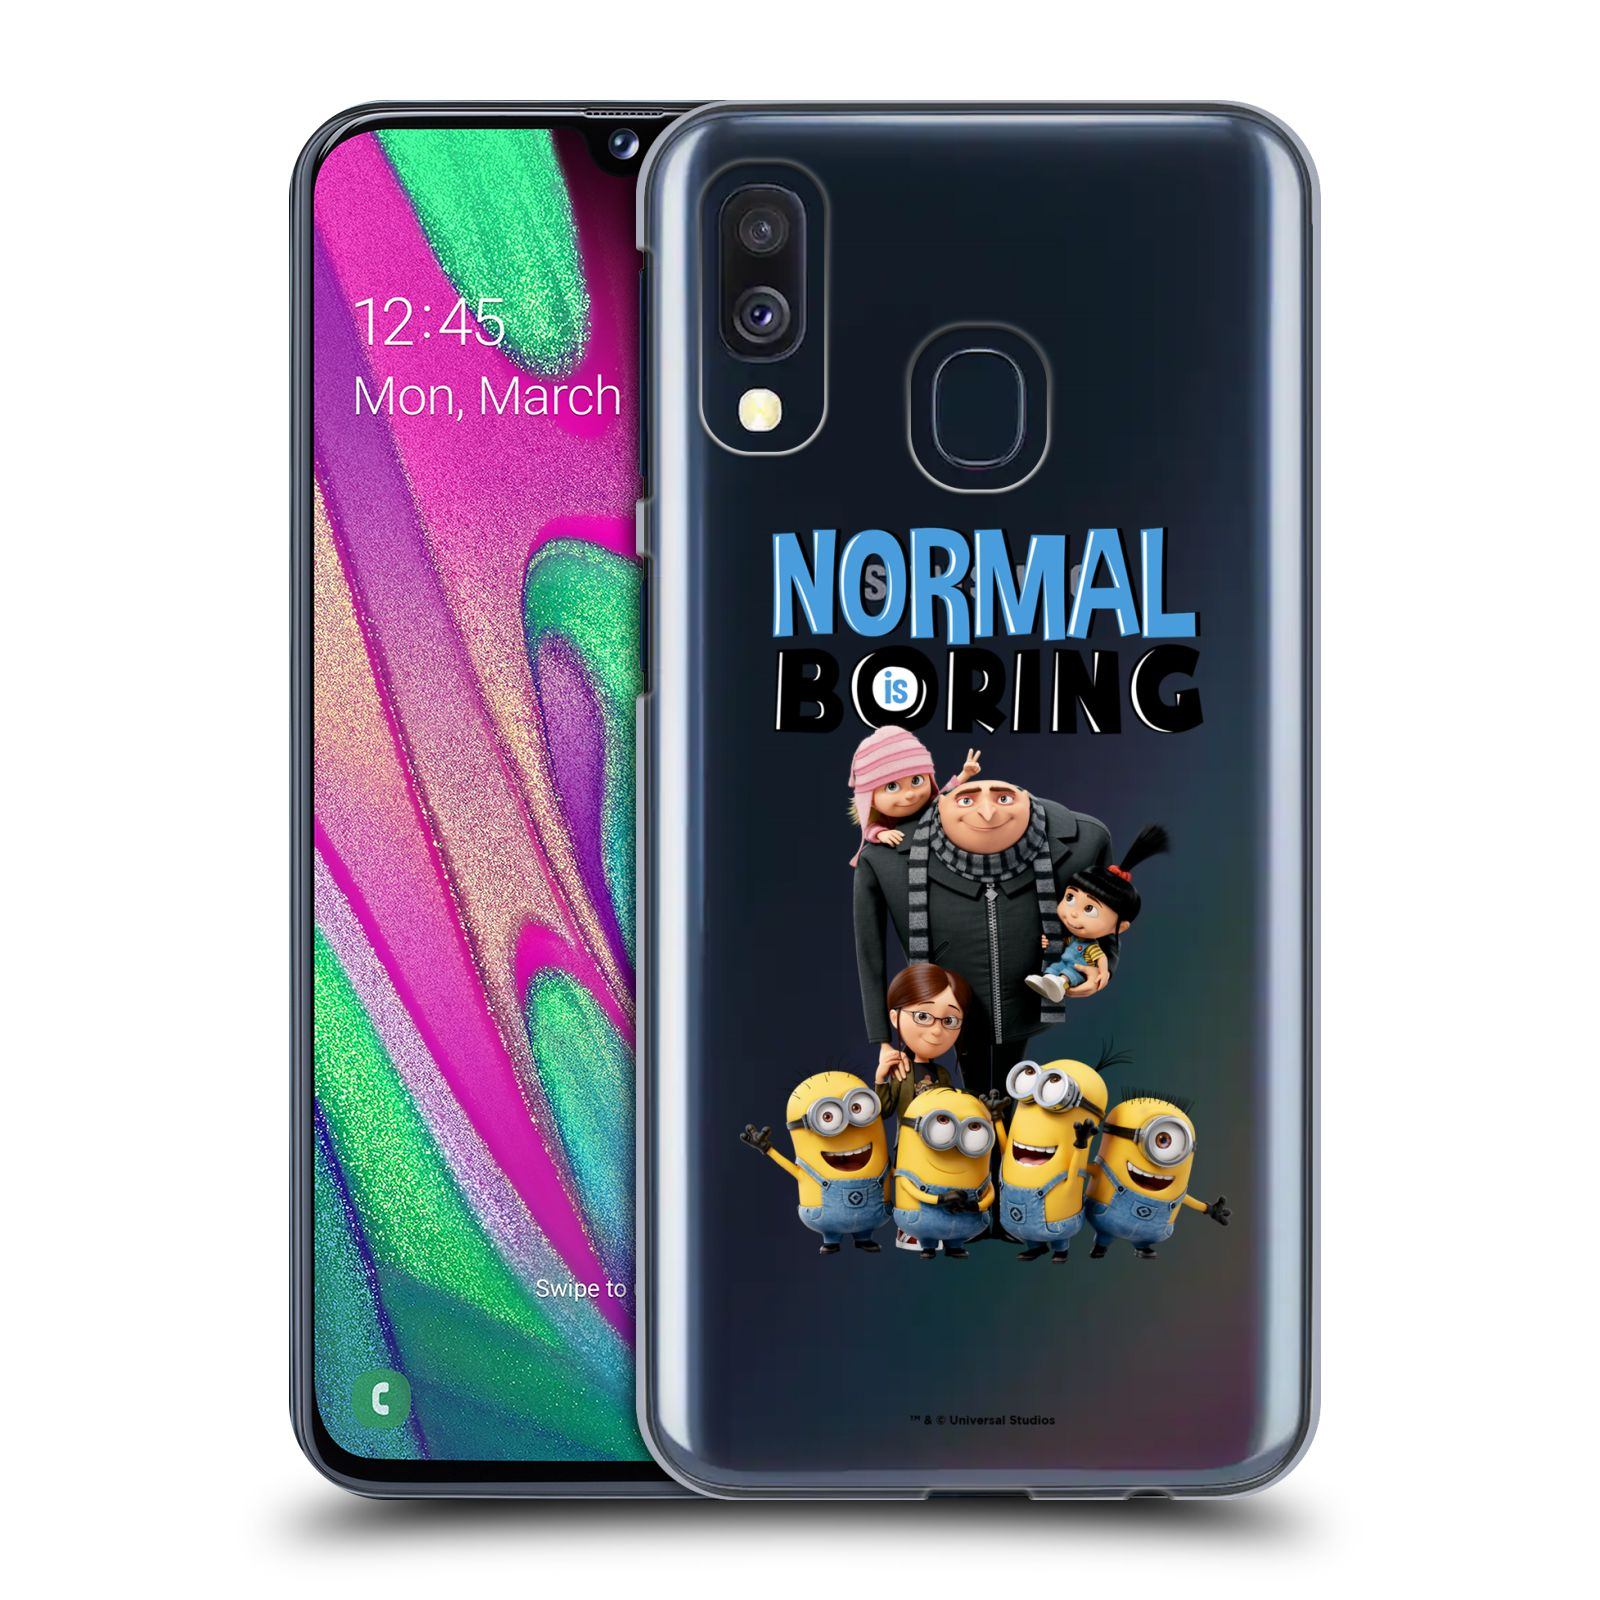 Plastové pouzdro na mobil Samsung Galaxy A40 - Head Case - Normal is boring z filmu Já, padouch - Despicable Me